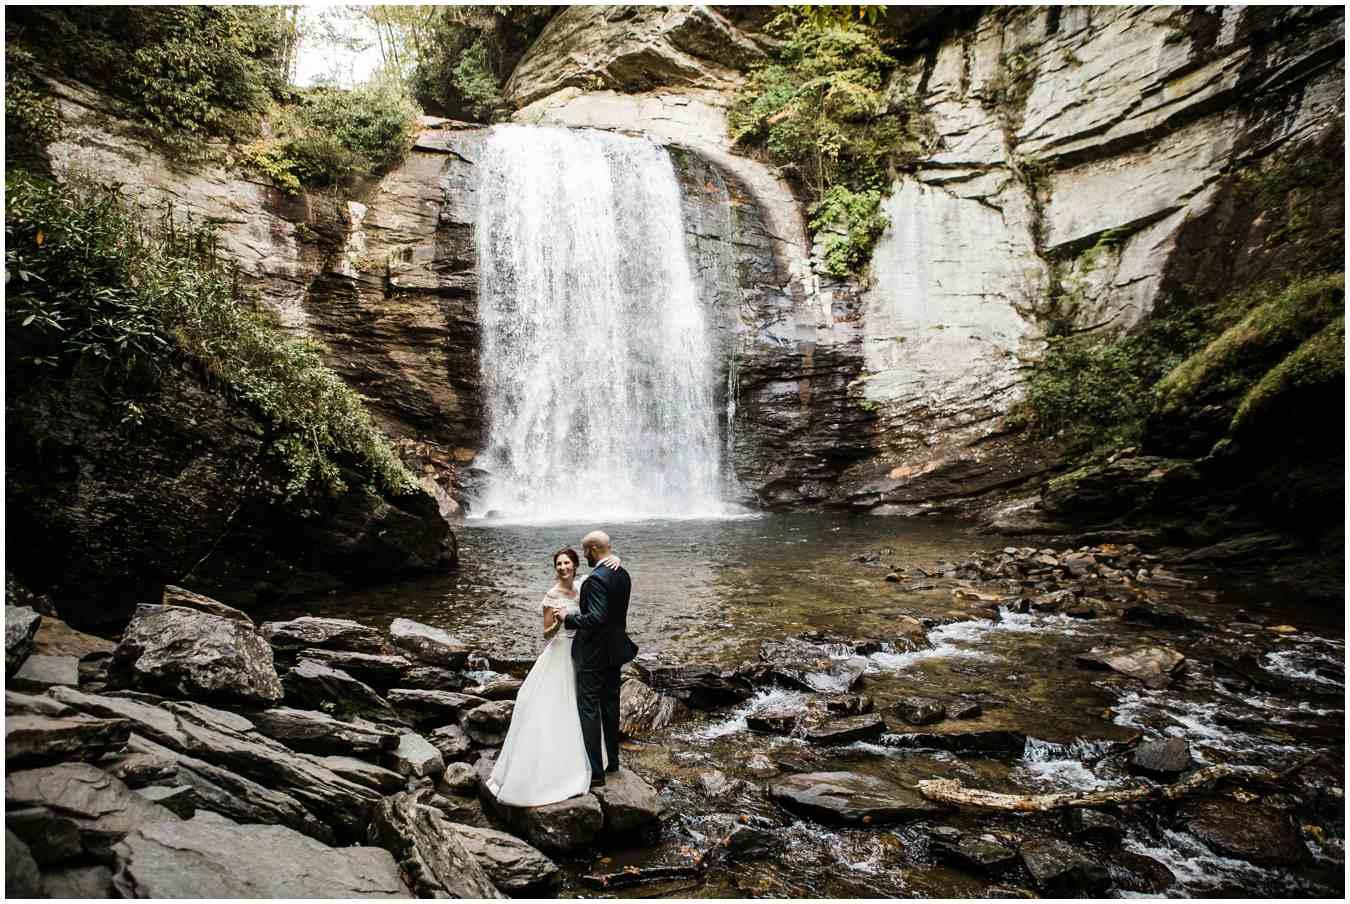 Waterfall wedding venue